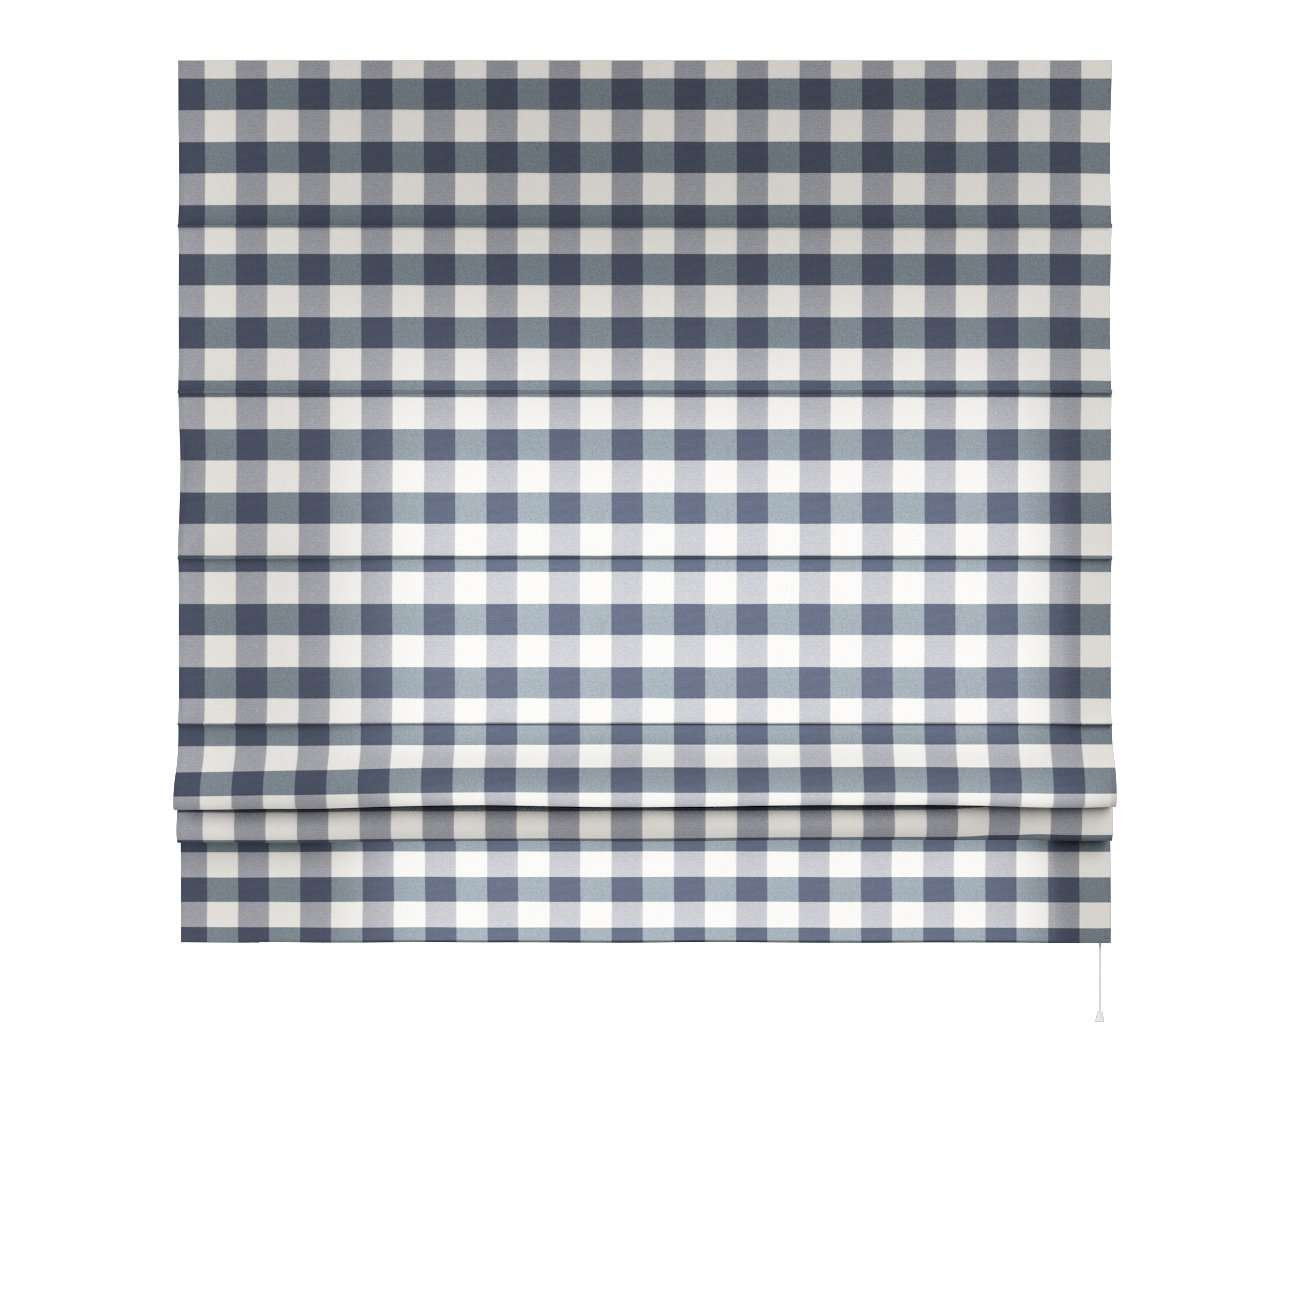 Rímska roleta Padva V kolekcii Quadro, tkanina: 136-03